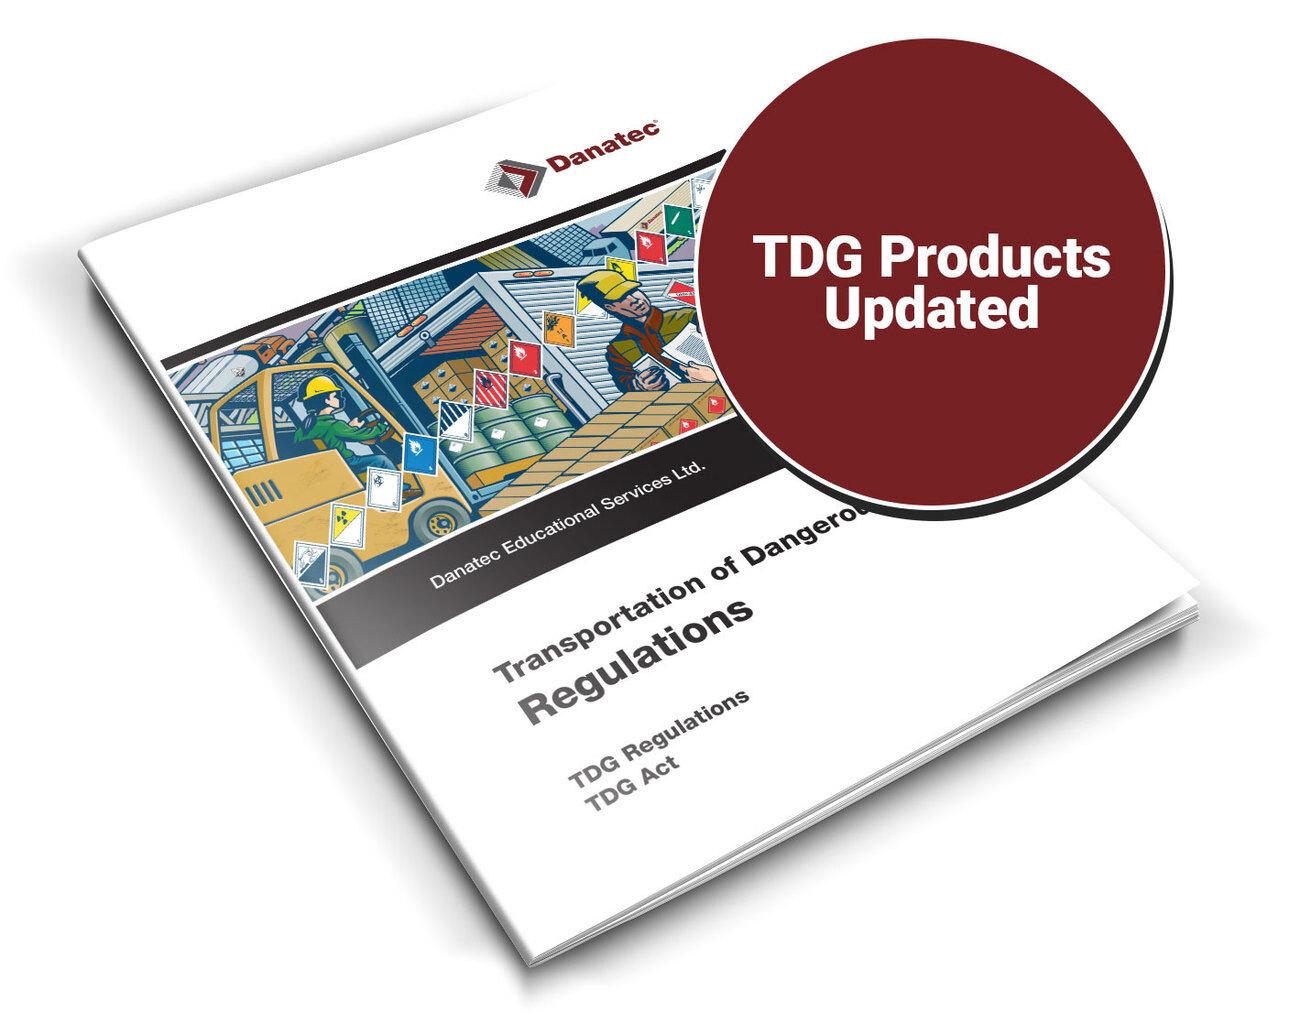 danatec-tdg-regulations